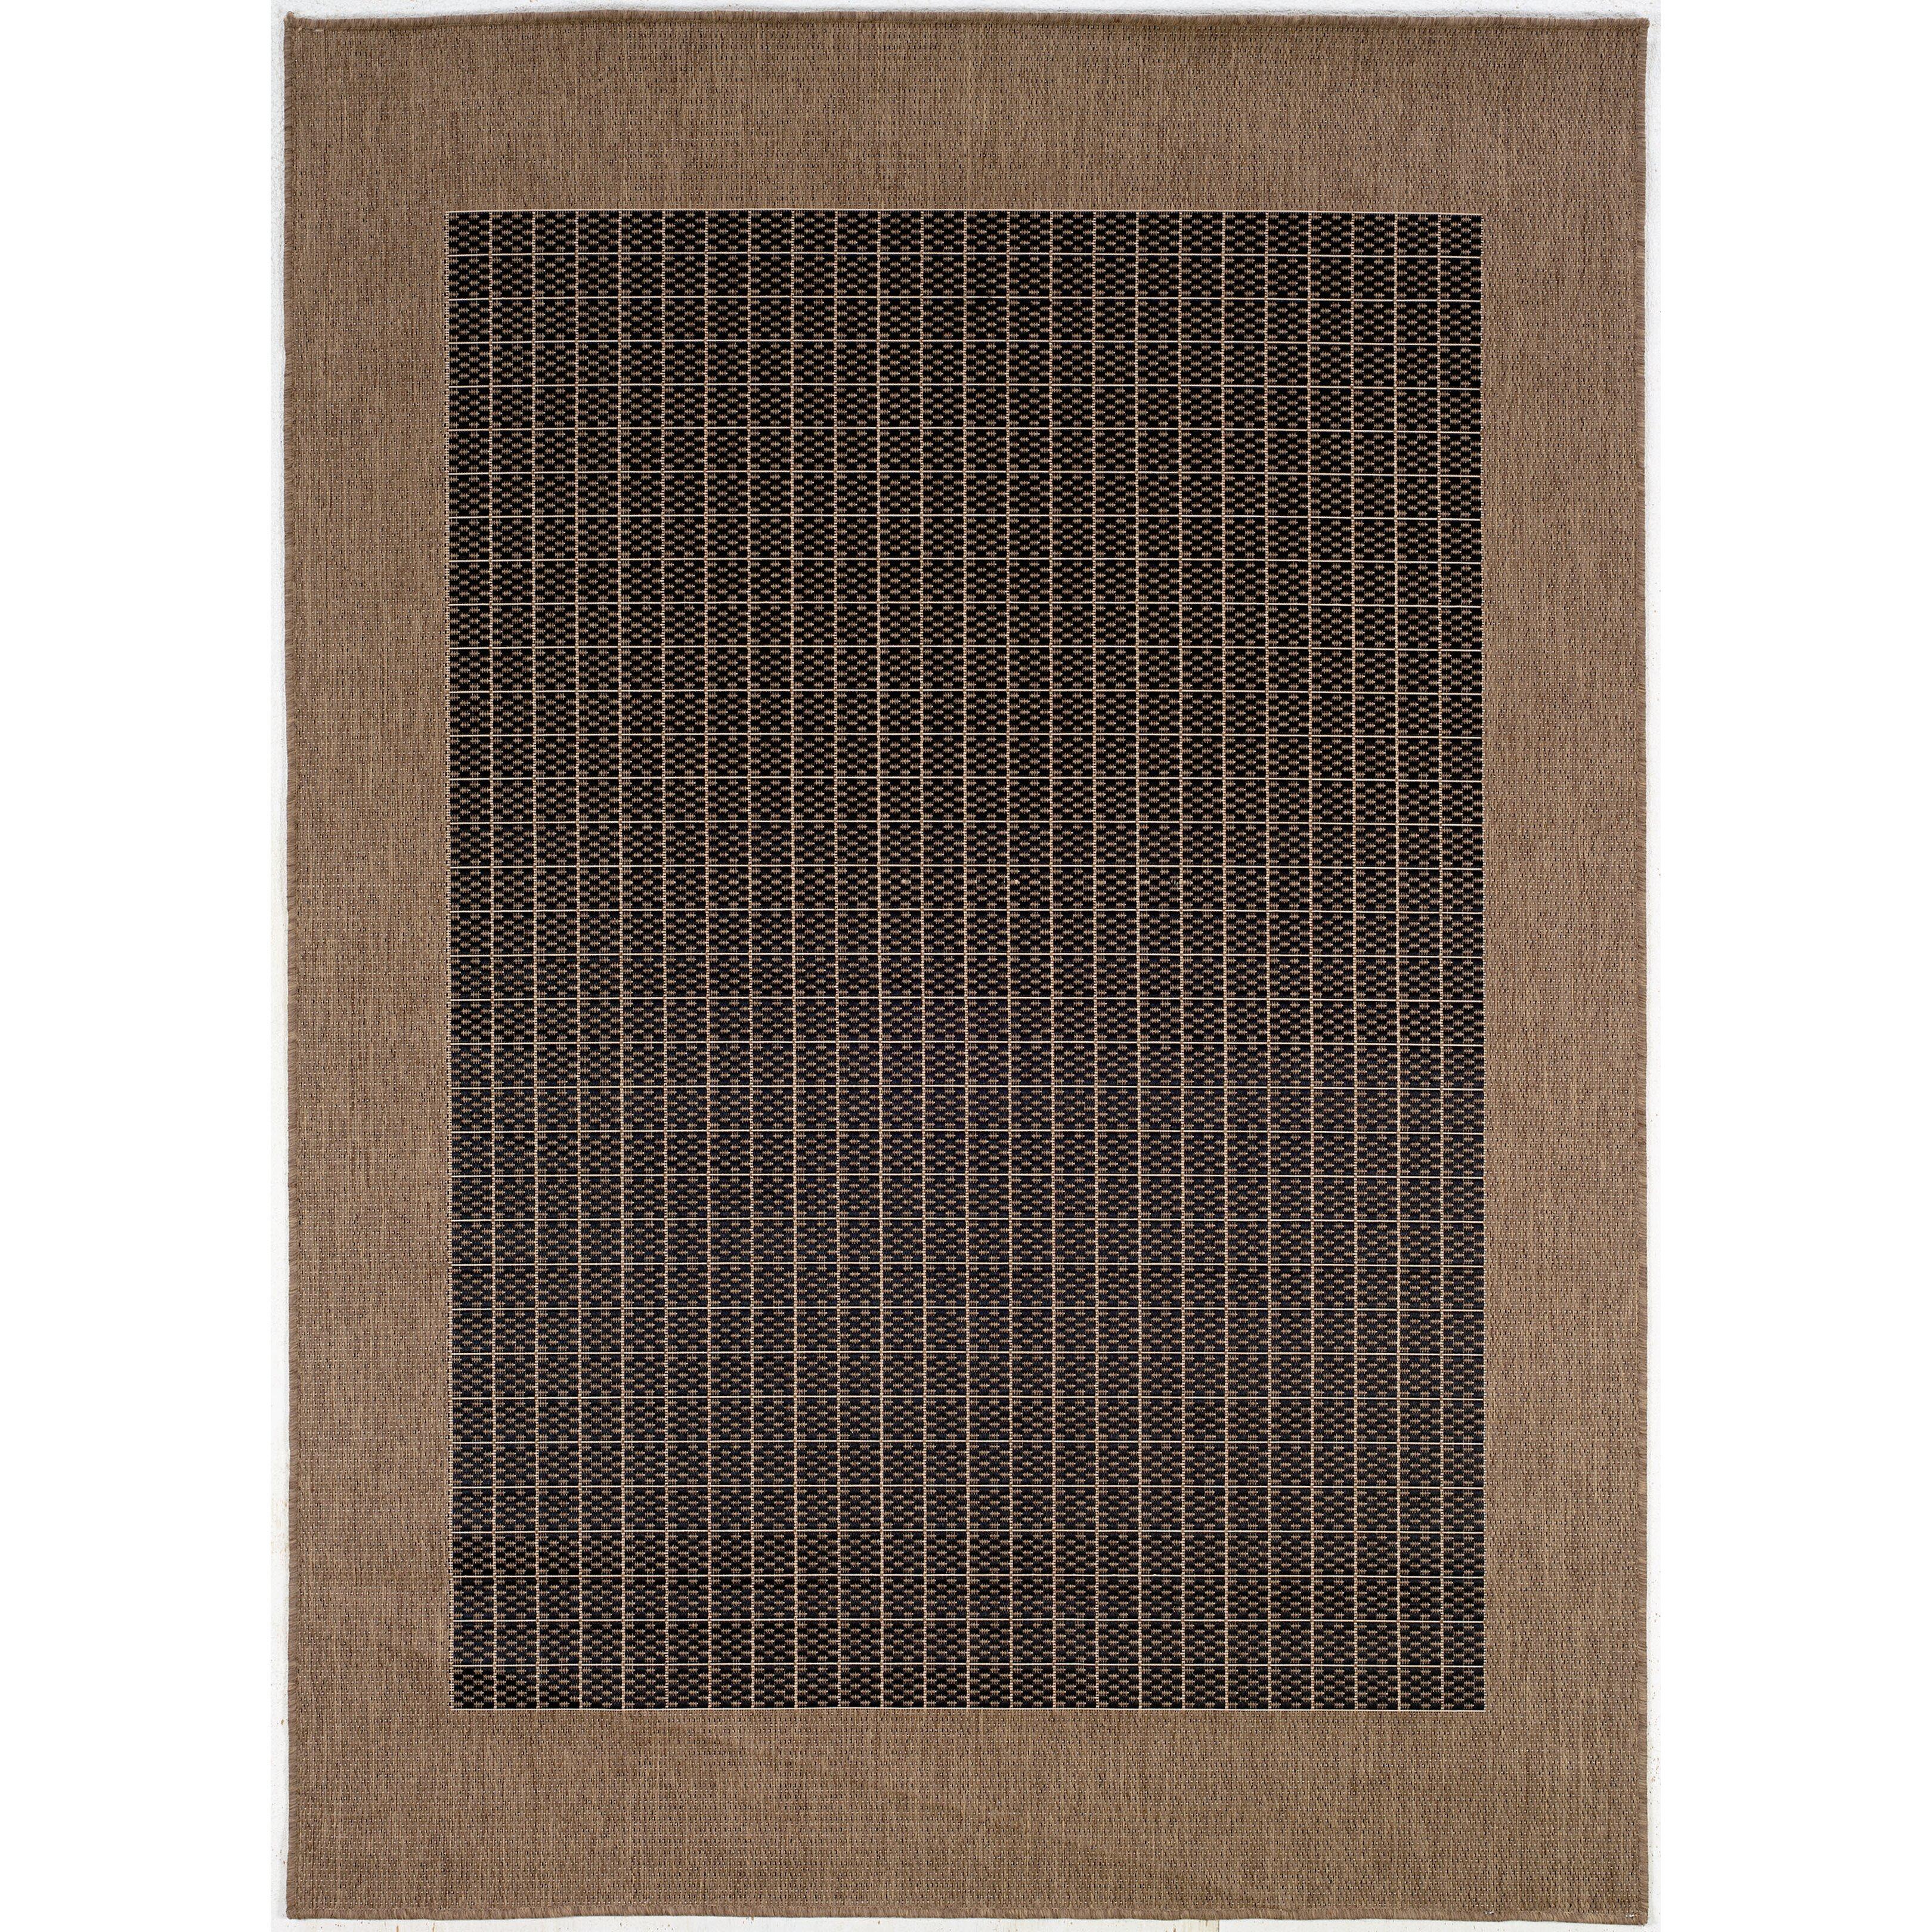 Checked Area Rugs: Couristan Recife Checkered Field Black Cocoa Indoor